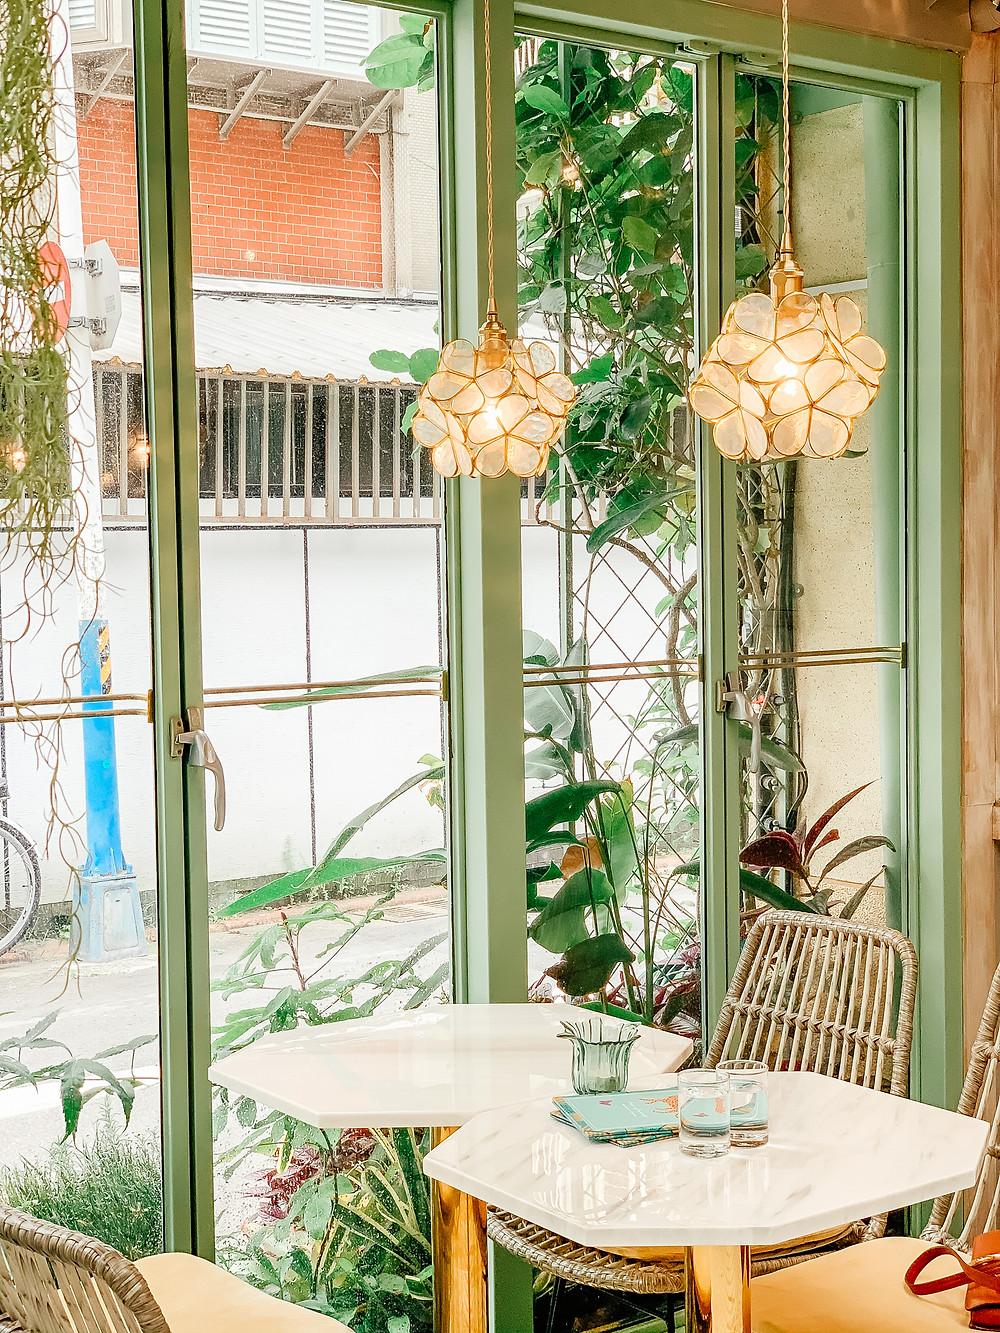 Taipei Cafe l Les Africot l Yongkang District Cafe l Taipei Eats l A Style Alike l Taipei Restaurant